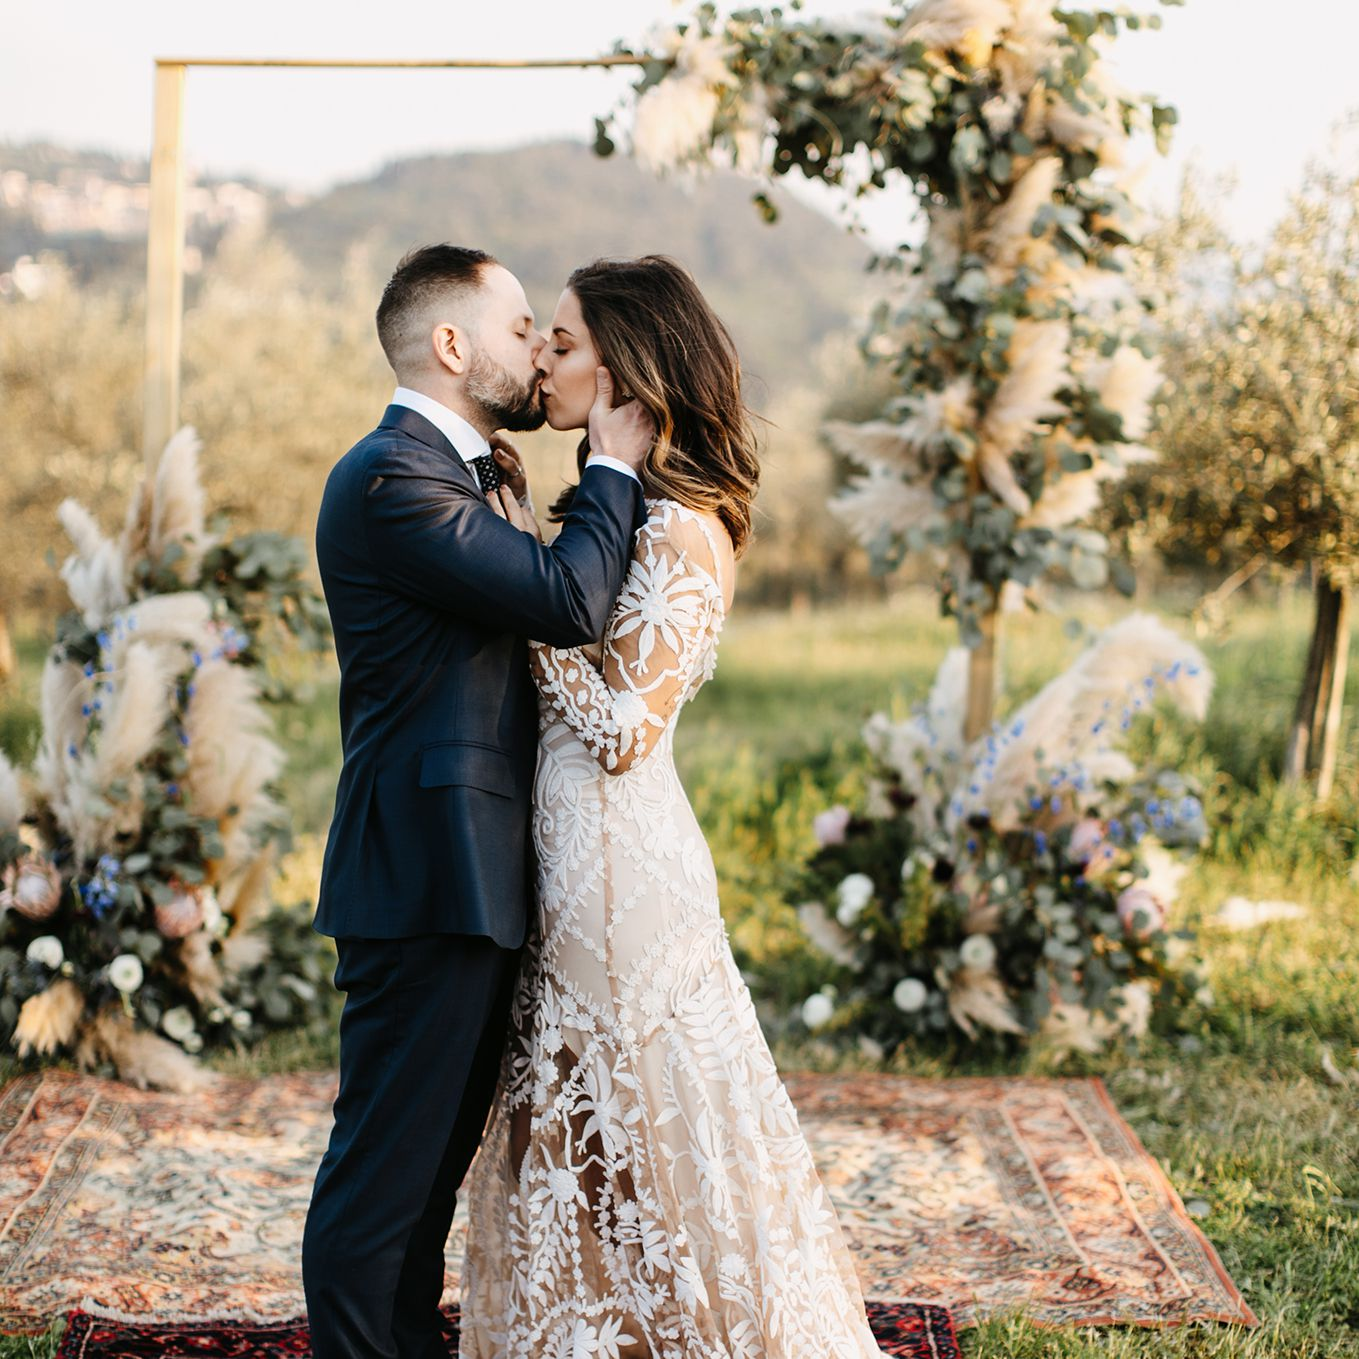 18 Stunning Boho Wedding Ideas